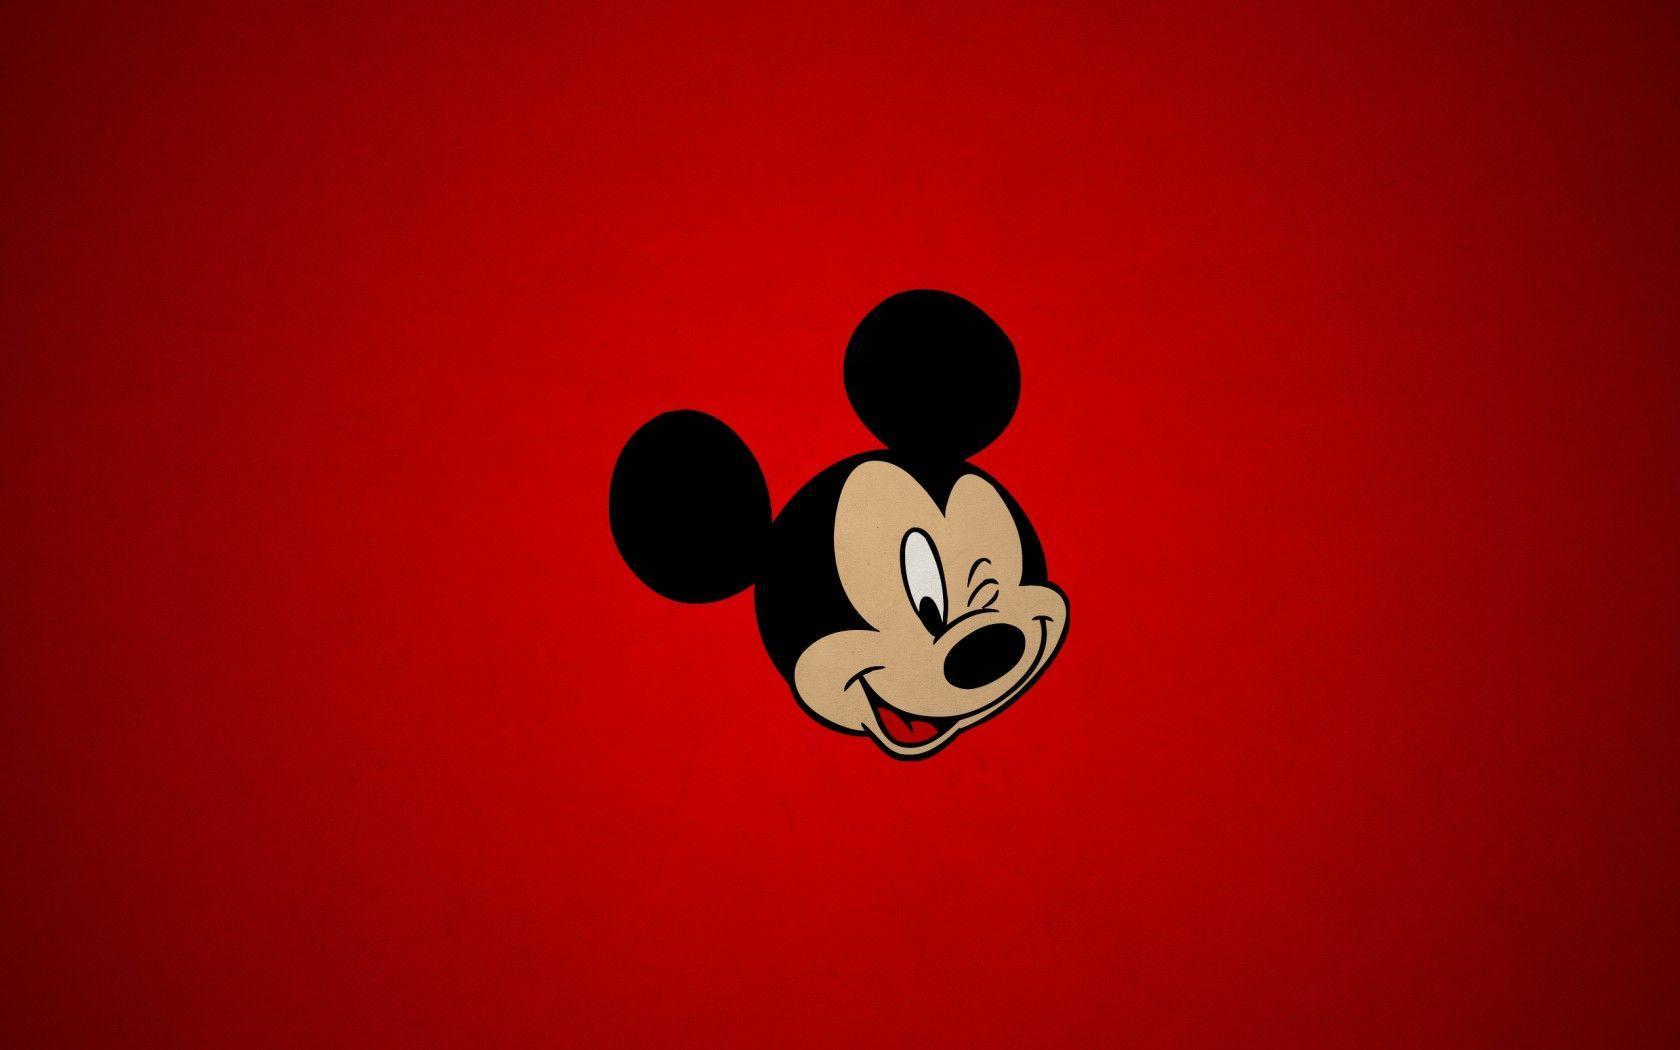 Dope Cartoon Iphone Wallpapers Top Free Dope Cartoon Iphone Backgrounds Wallpaperaccess